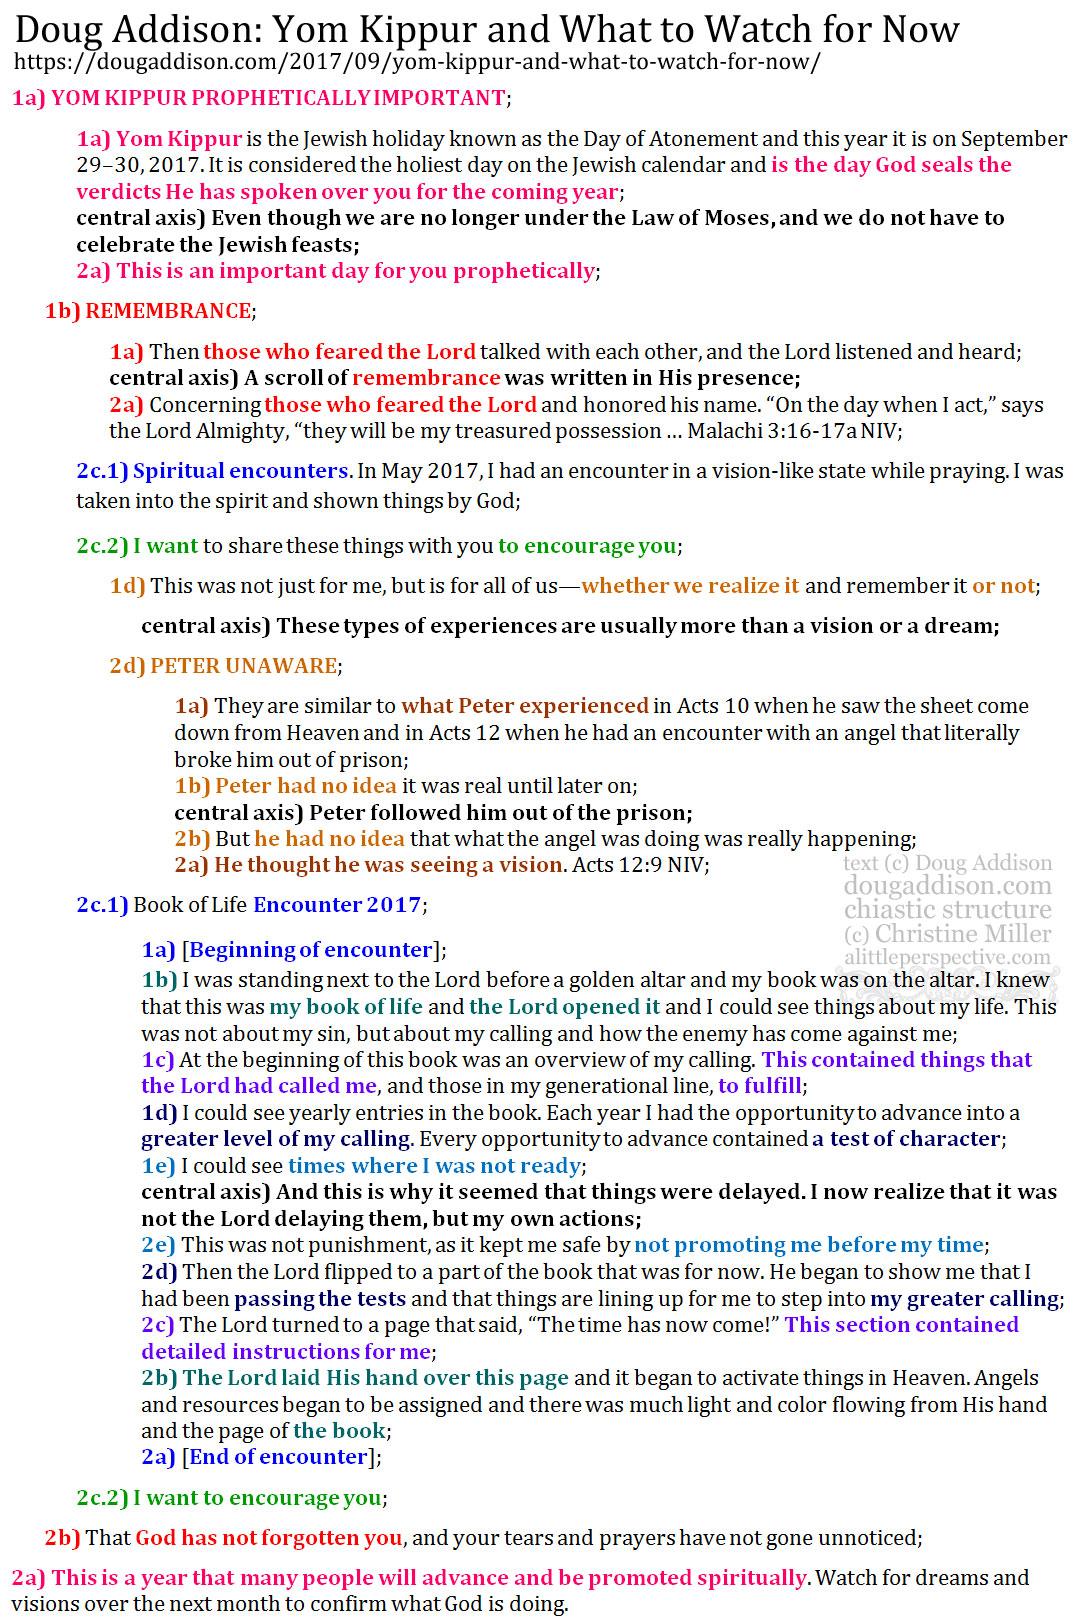 Doug Addison 28 Sep 2017 prophetic word chiasm   the hebraic life at alittleperspective.com